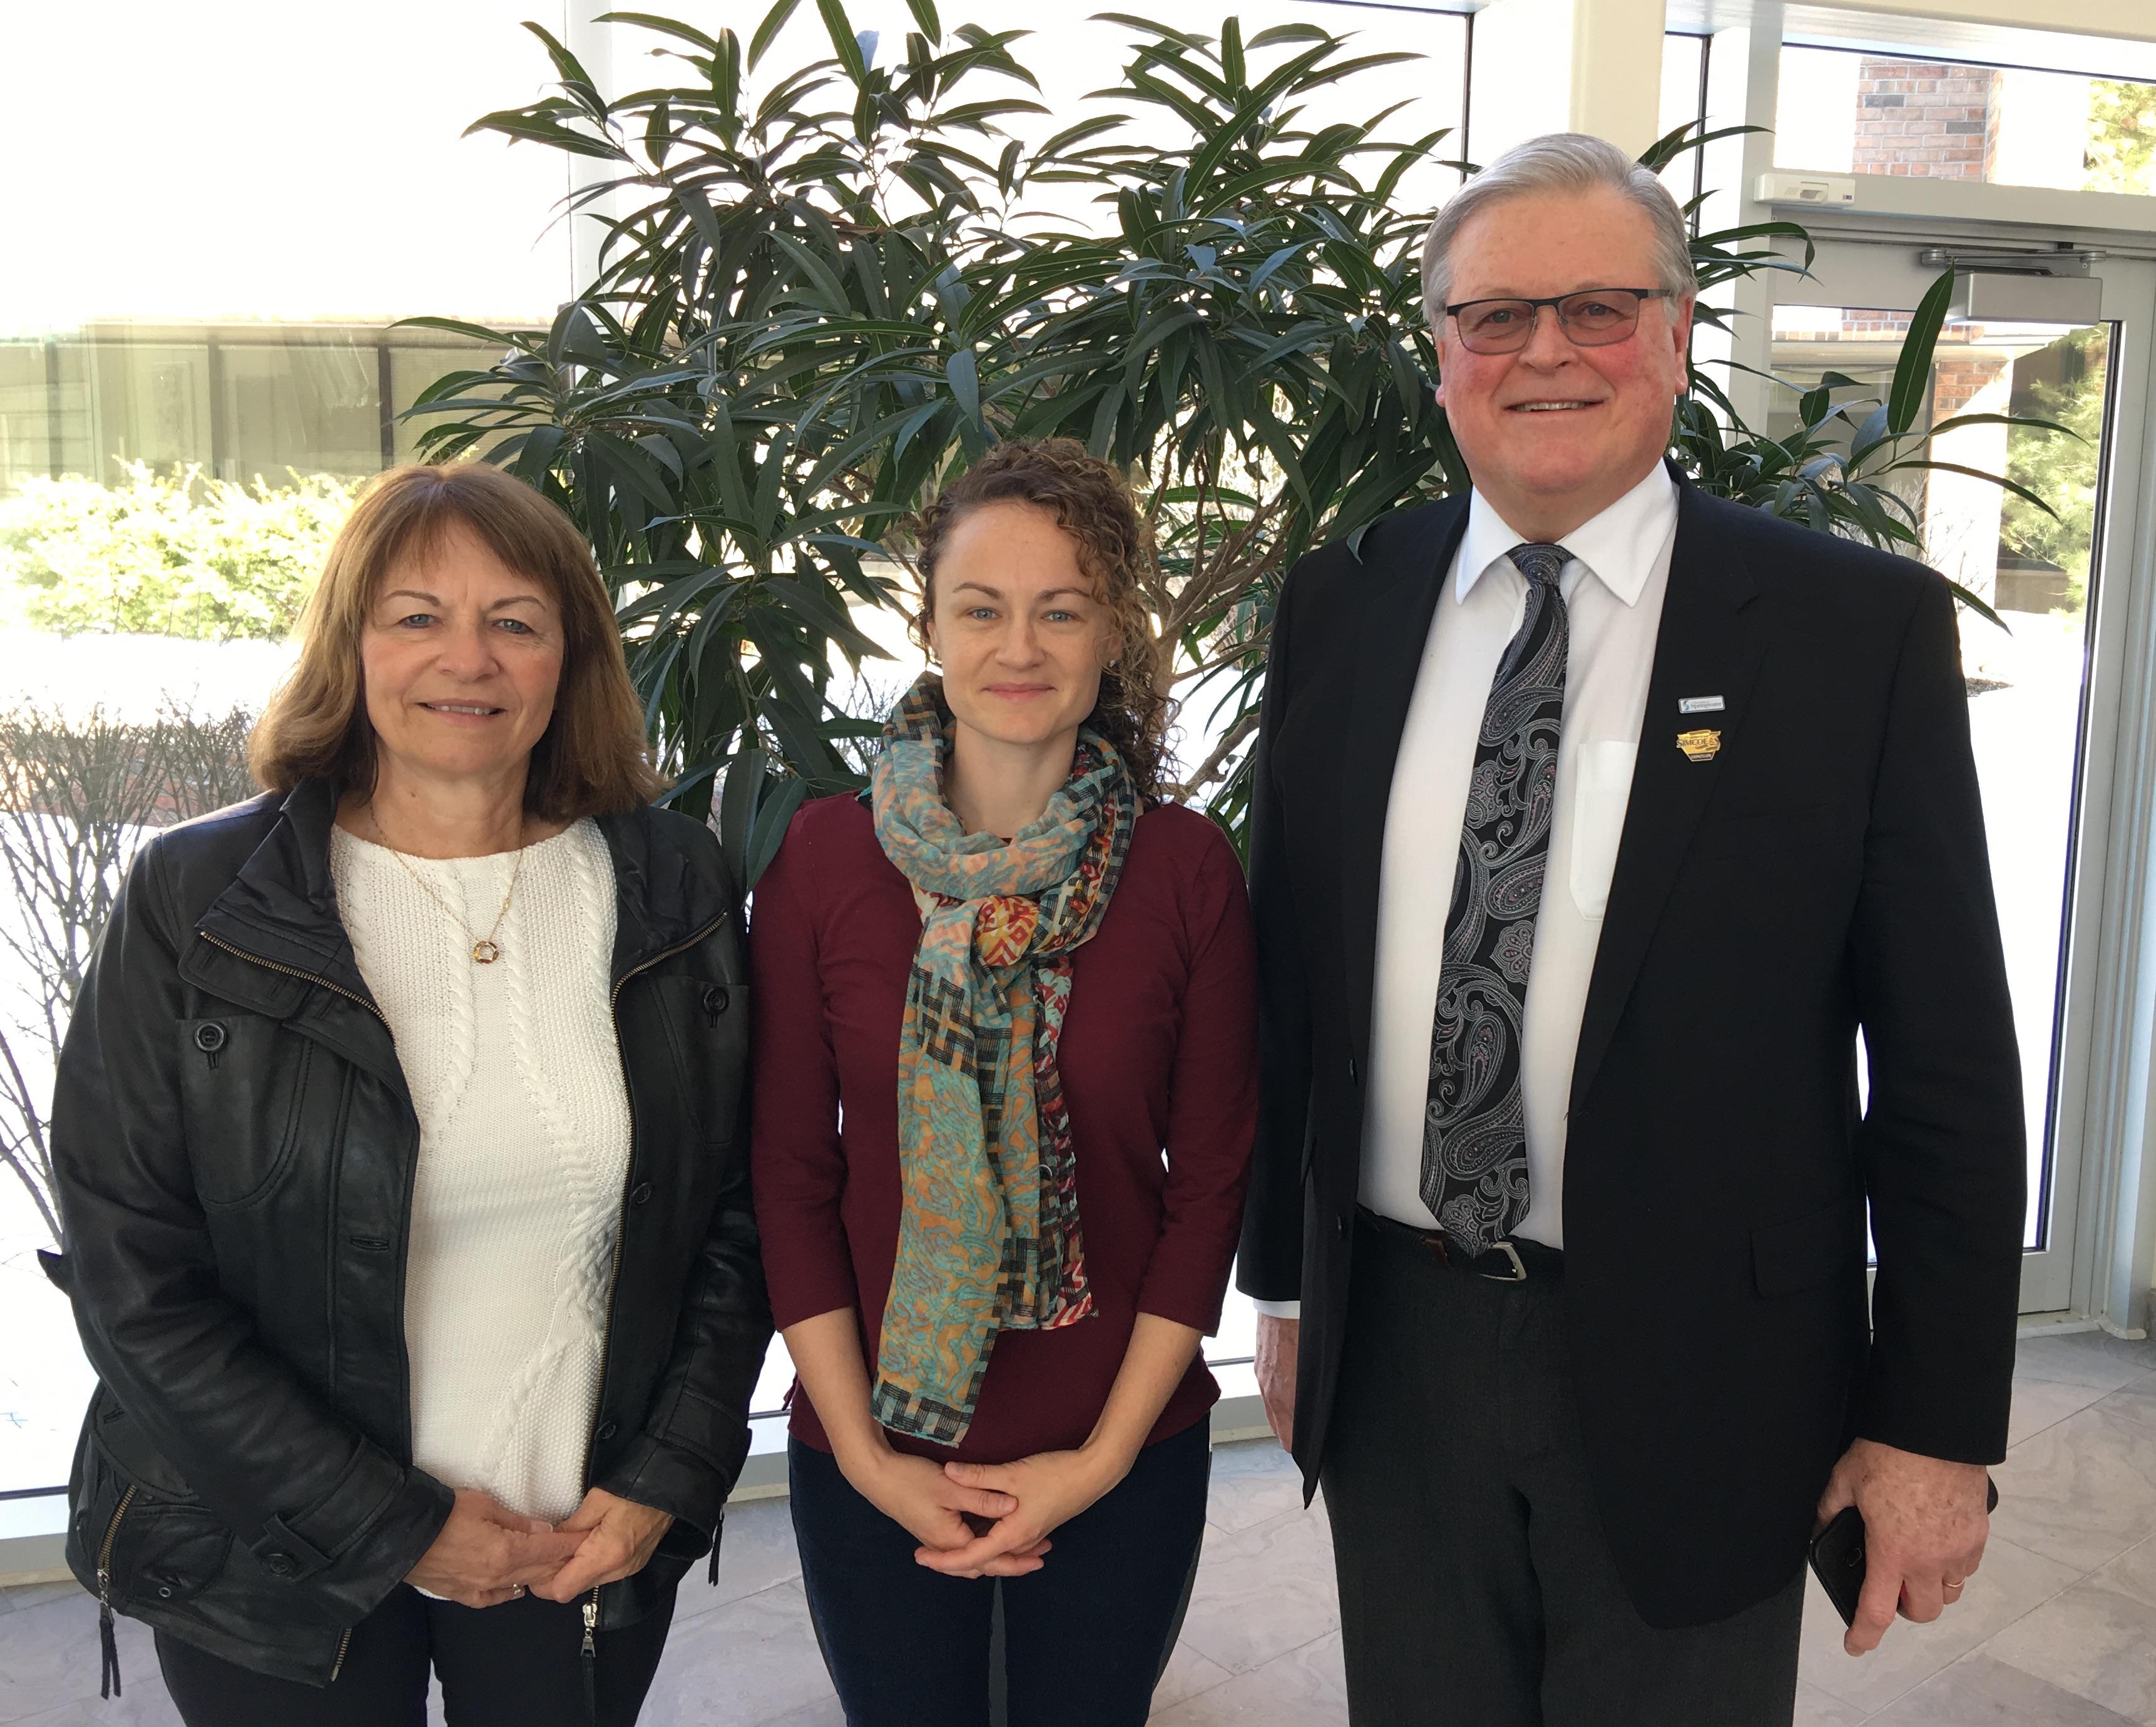 Janet and Karen Spring with Springwater Mayor Don Allen, in 2018 photo